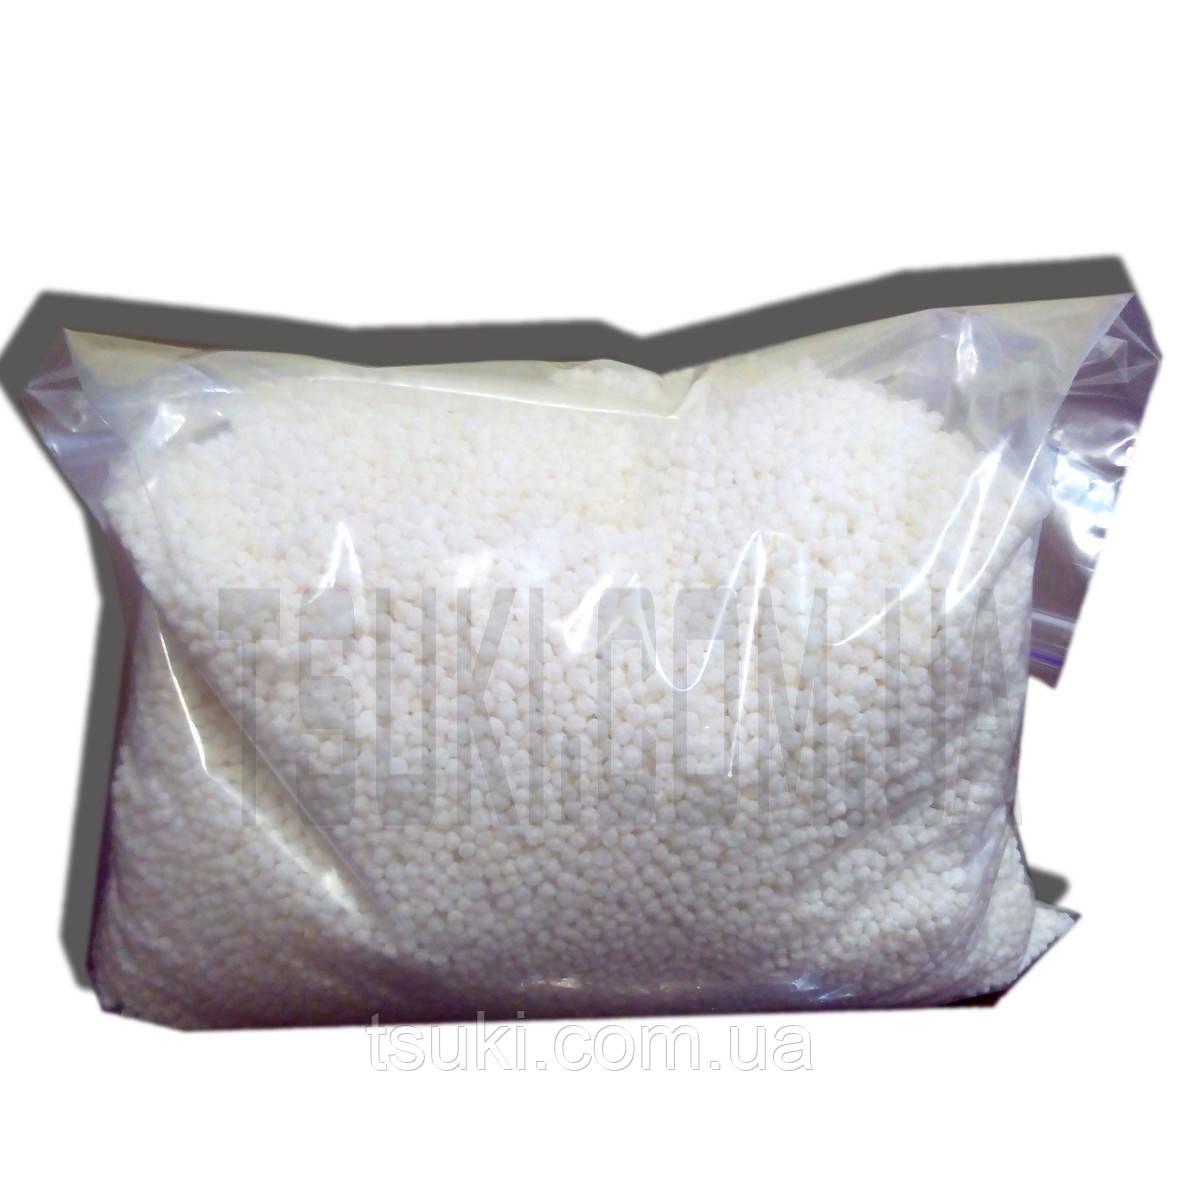 Декор топпинг рисовые шарики 1-3мм 0,5кг